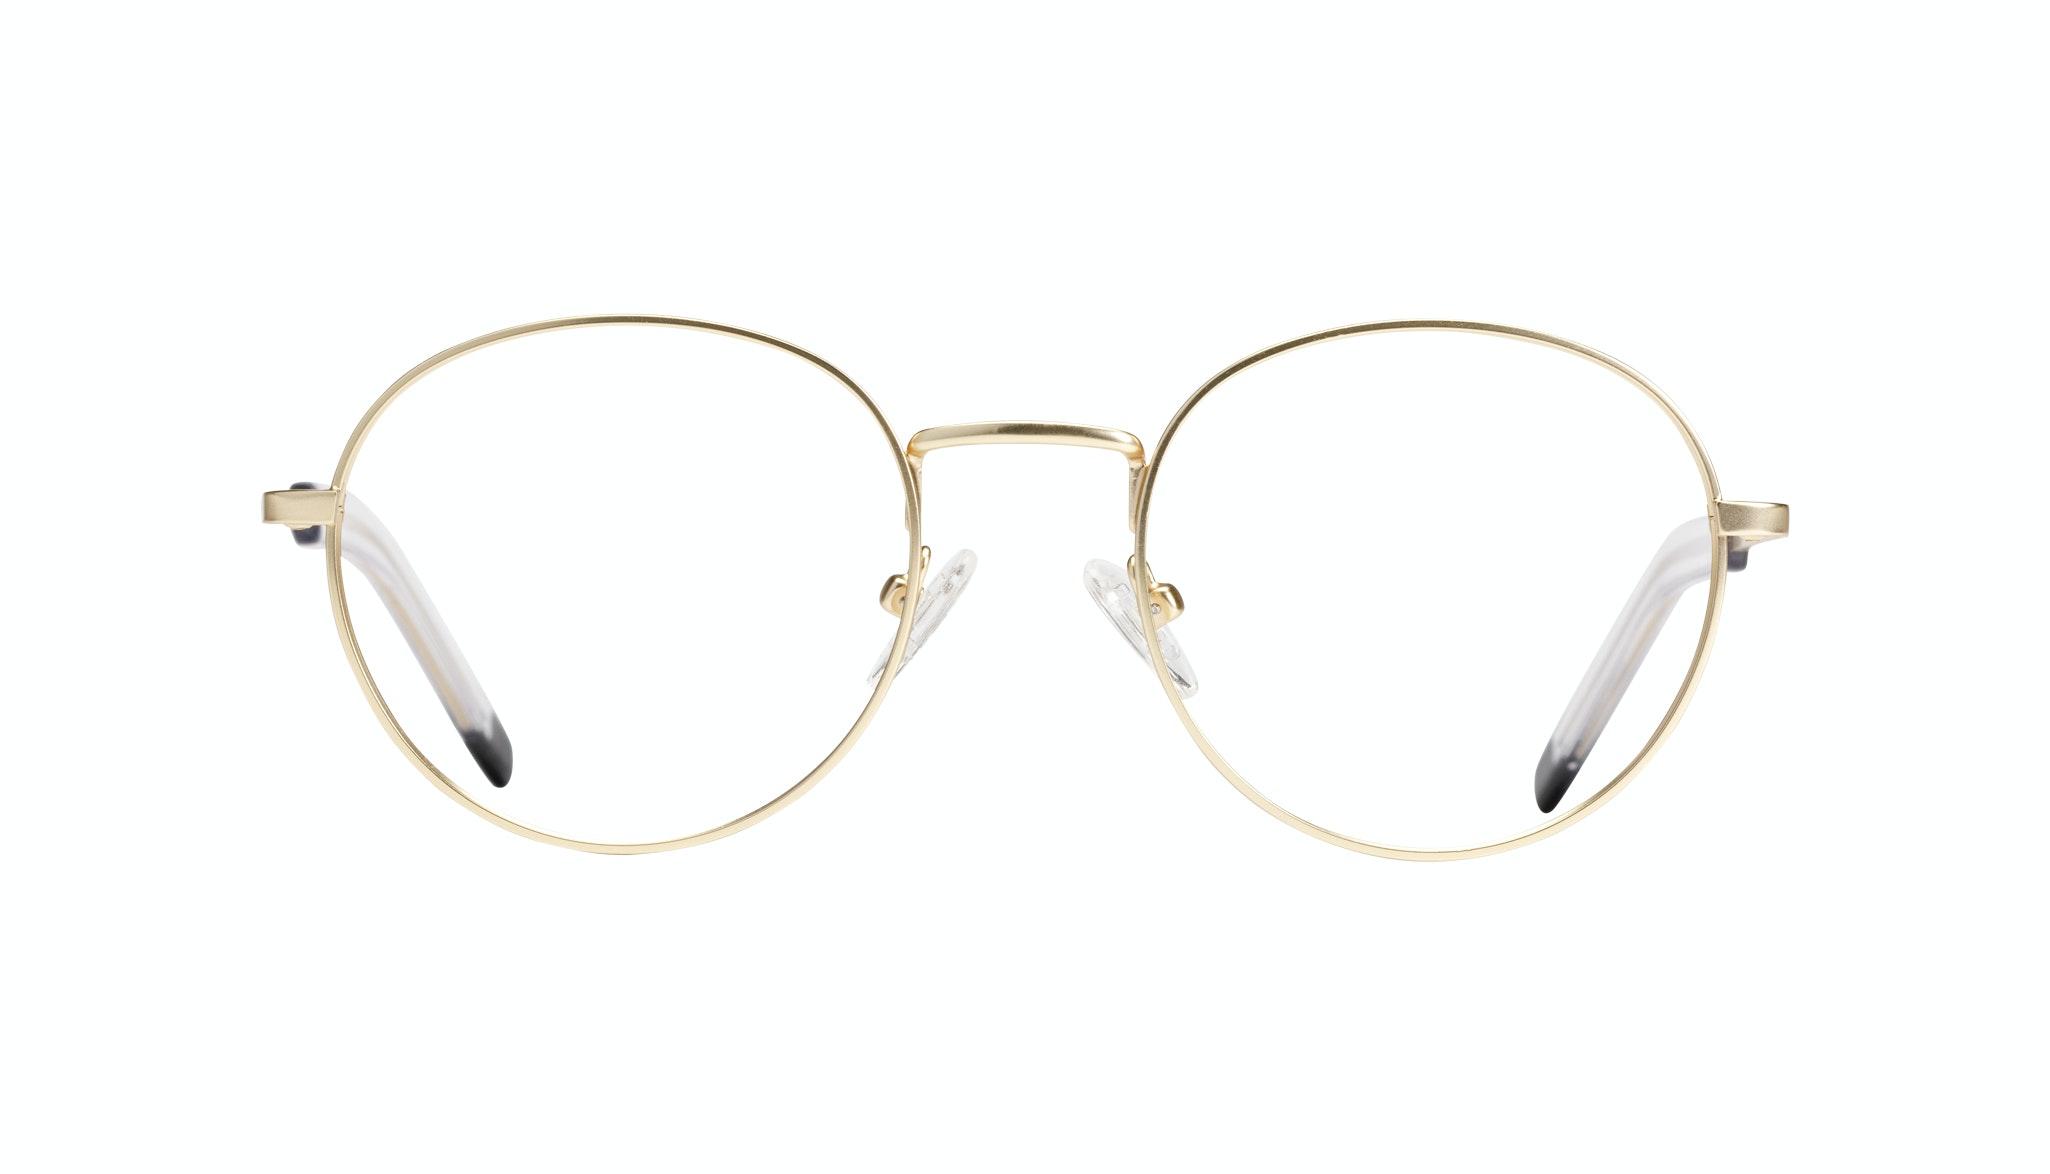 Affordable Fashion Glasses Round Eyeglasses Men Lean Gold Matte Front